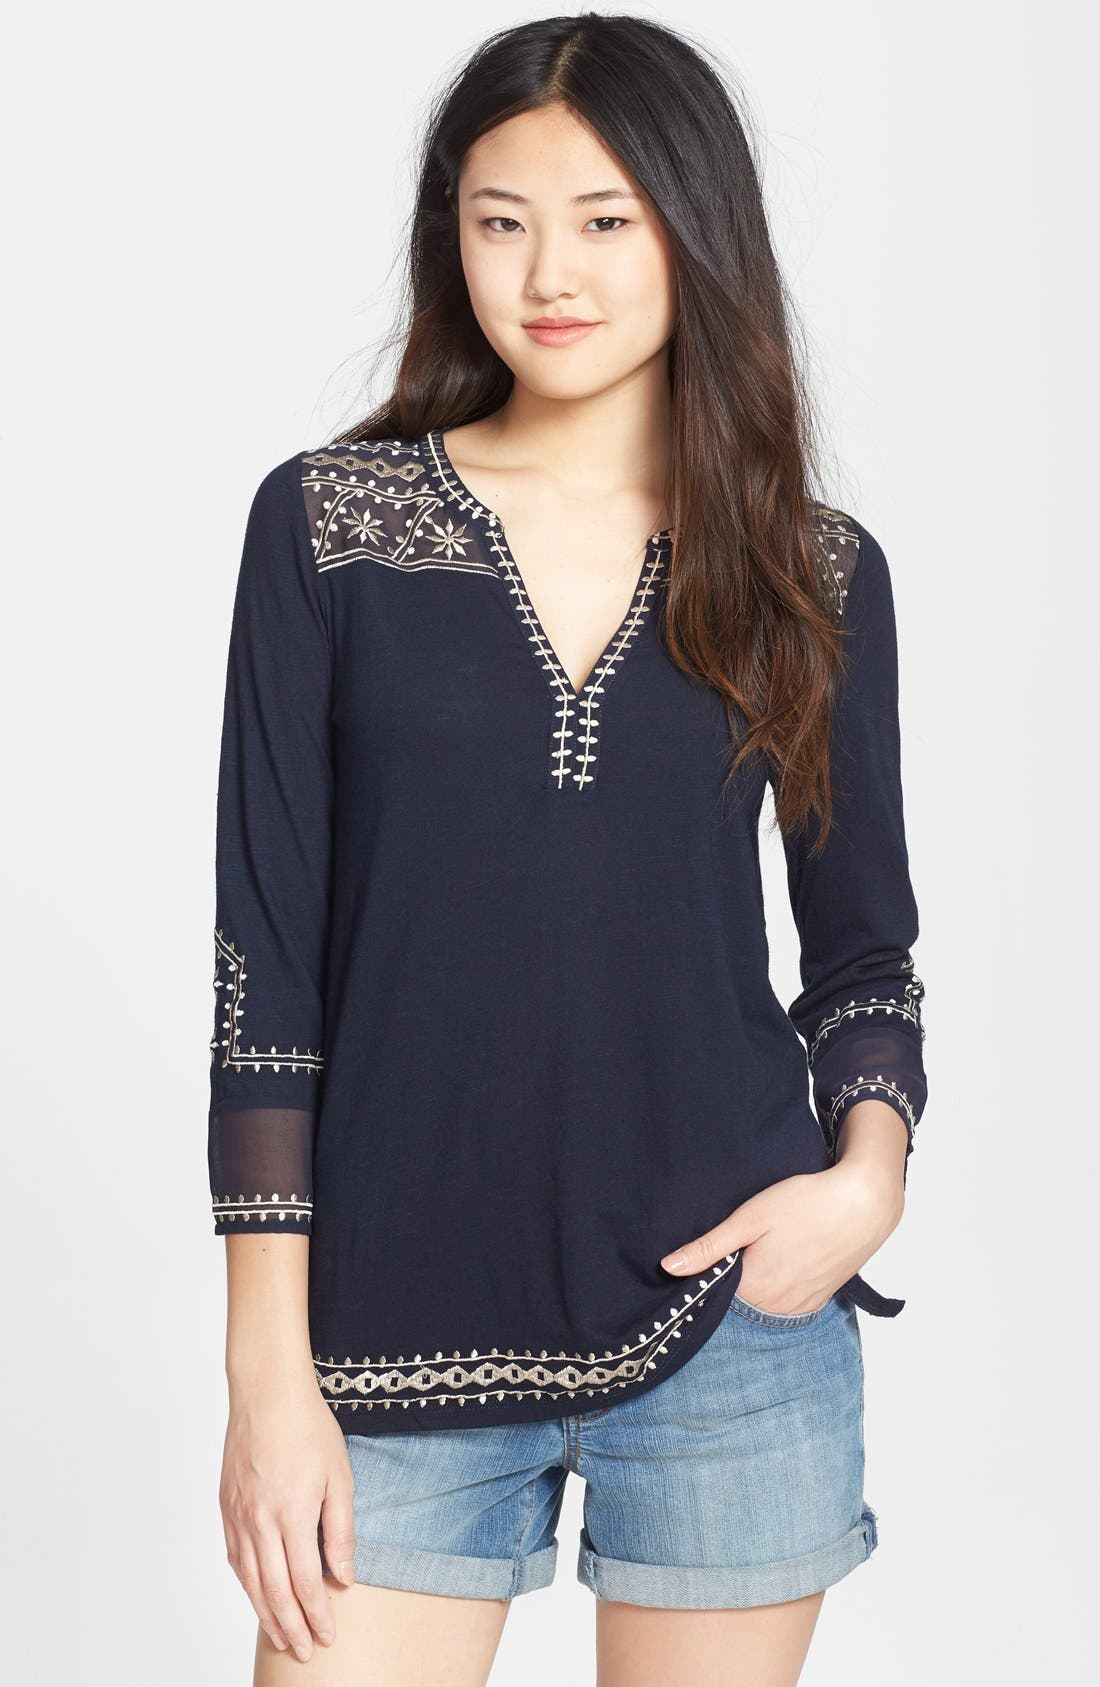 Main Image - Lucky Brand 'Kiana' Embroidered Tunic Top